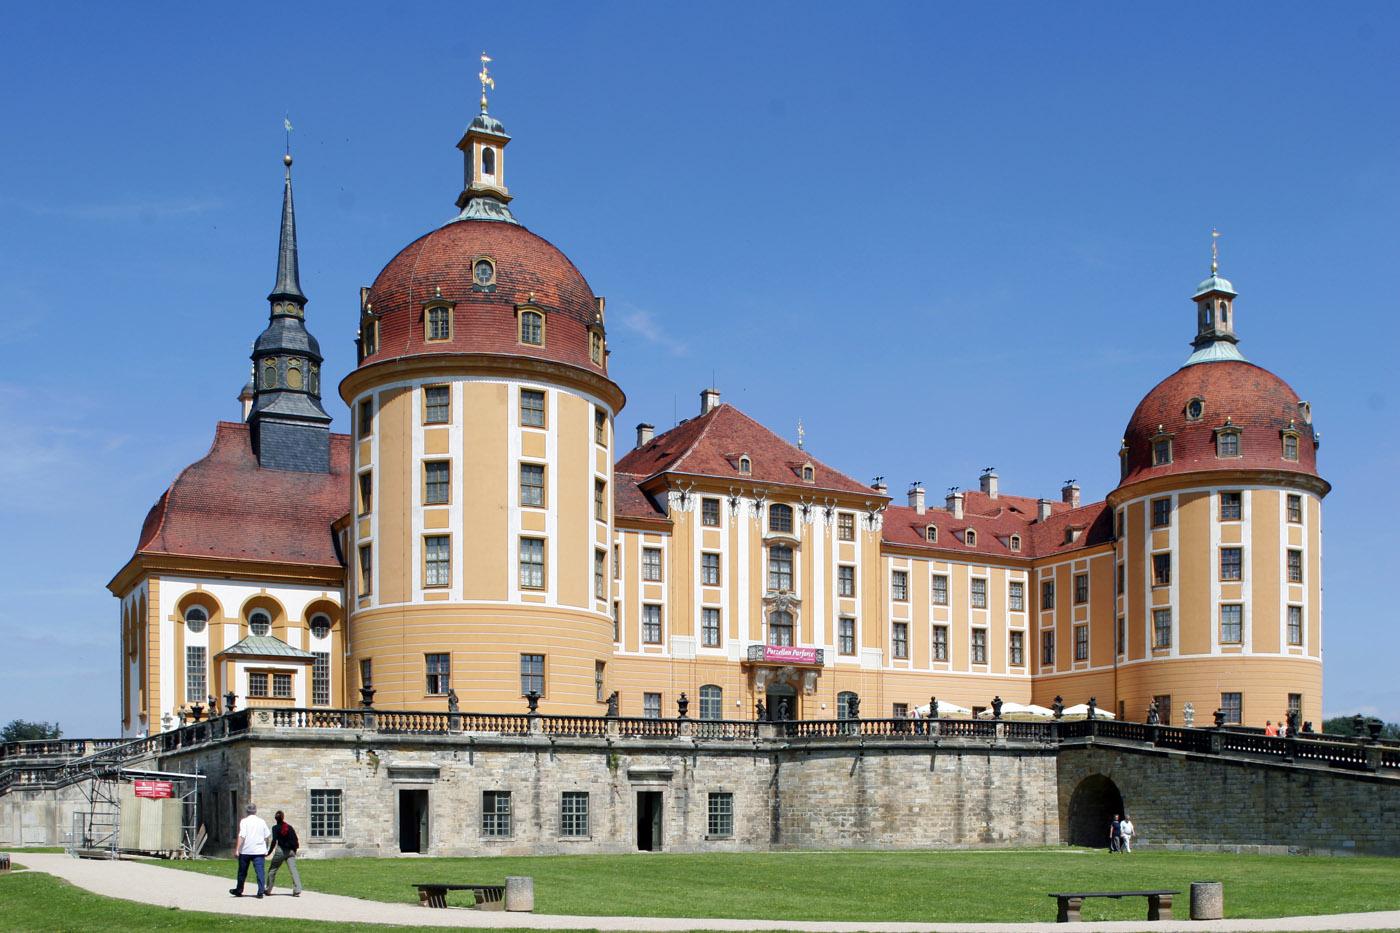 Moritzburgi vald